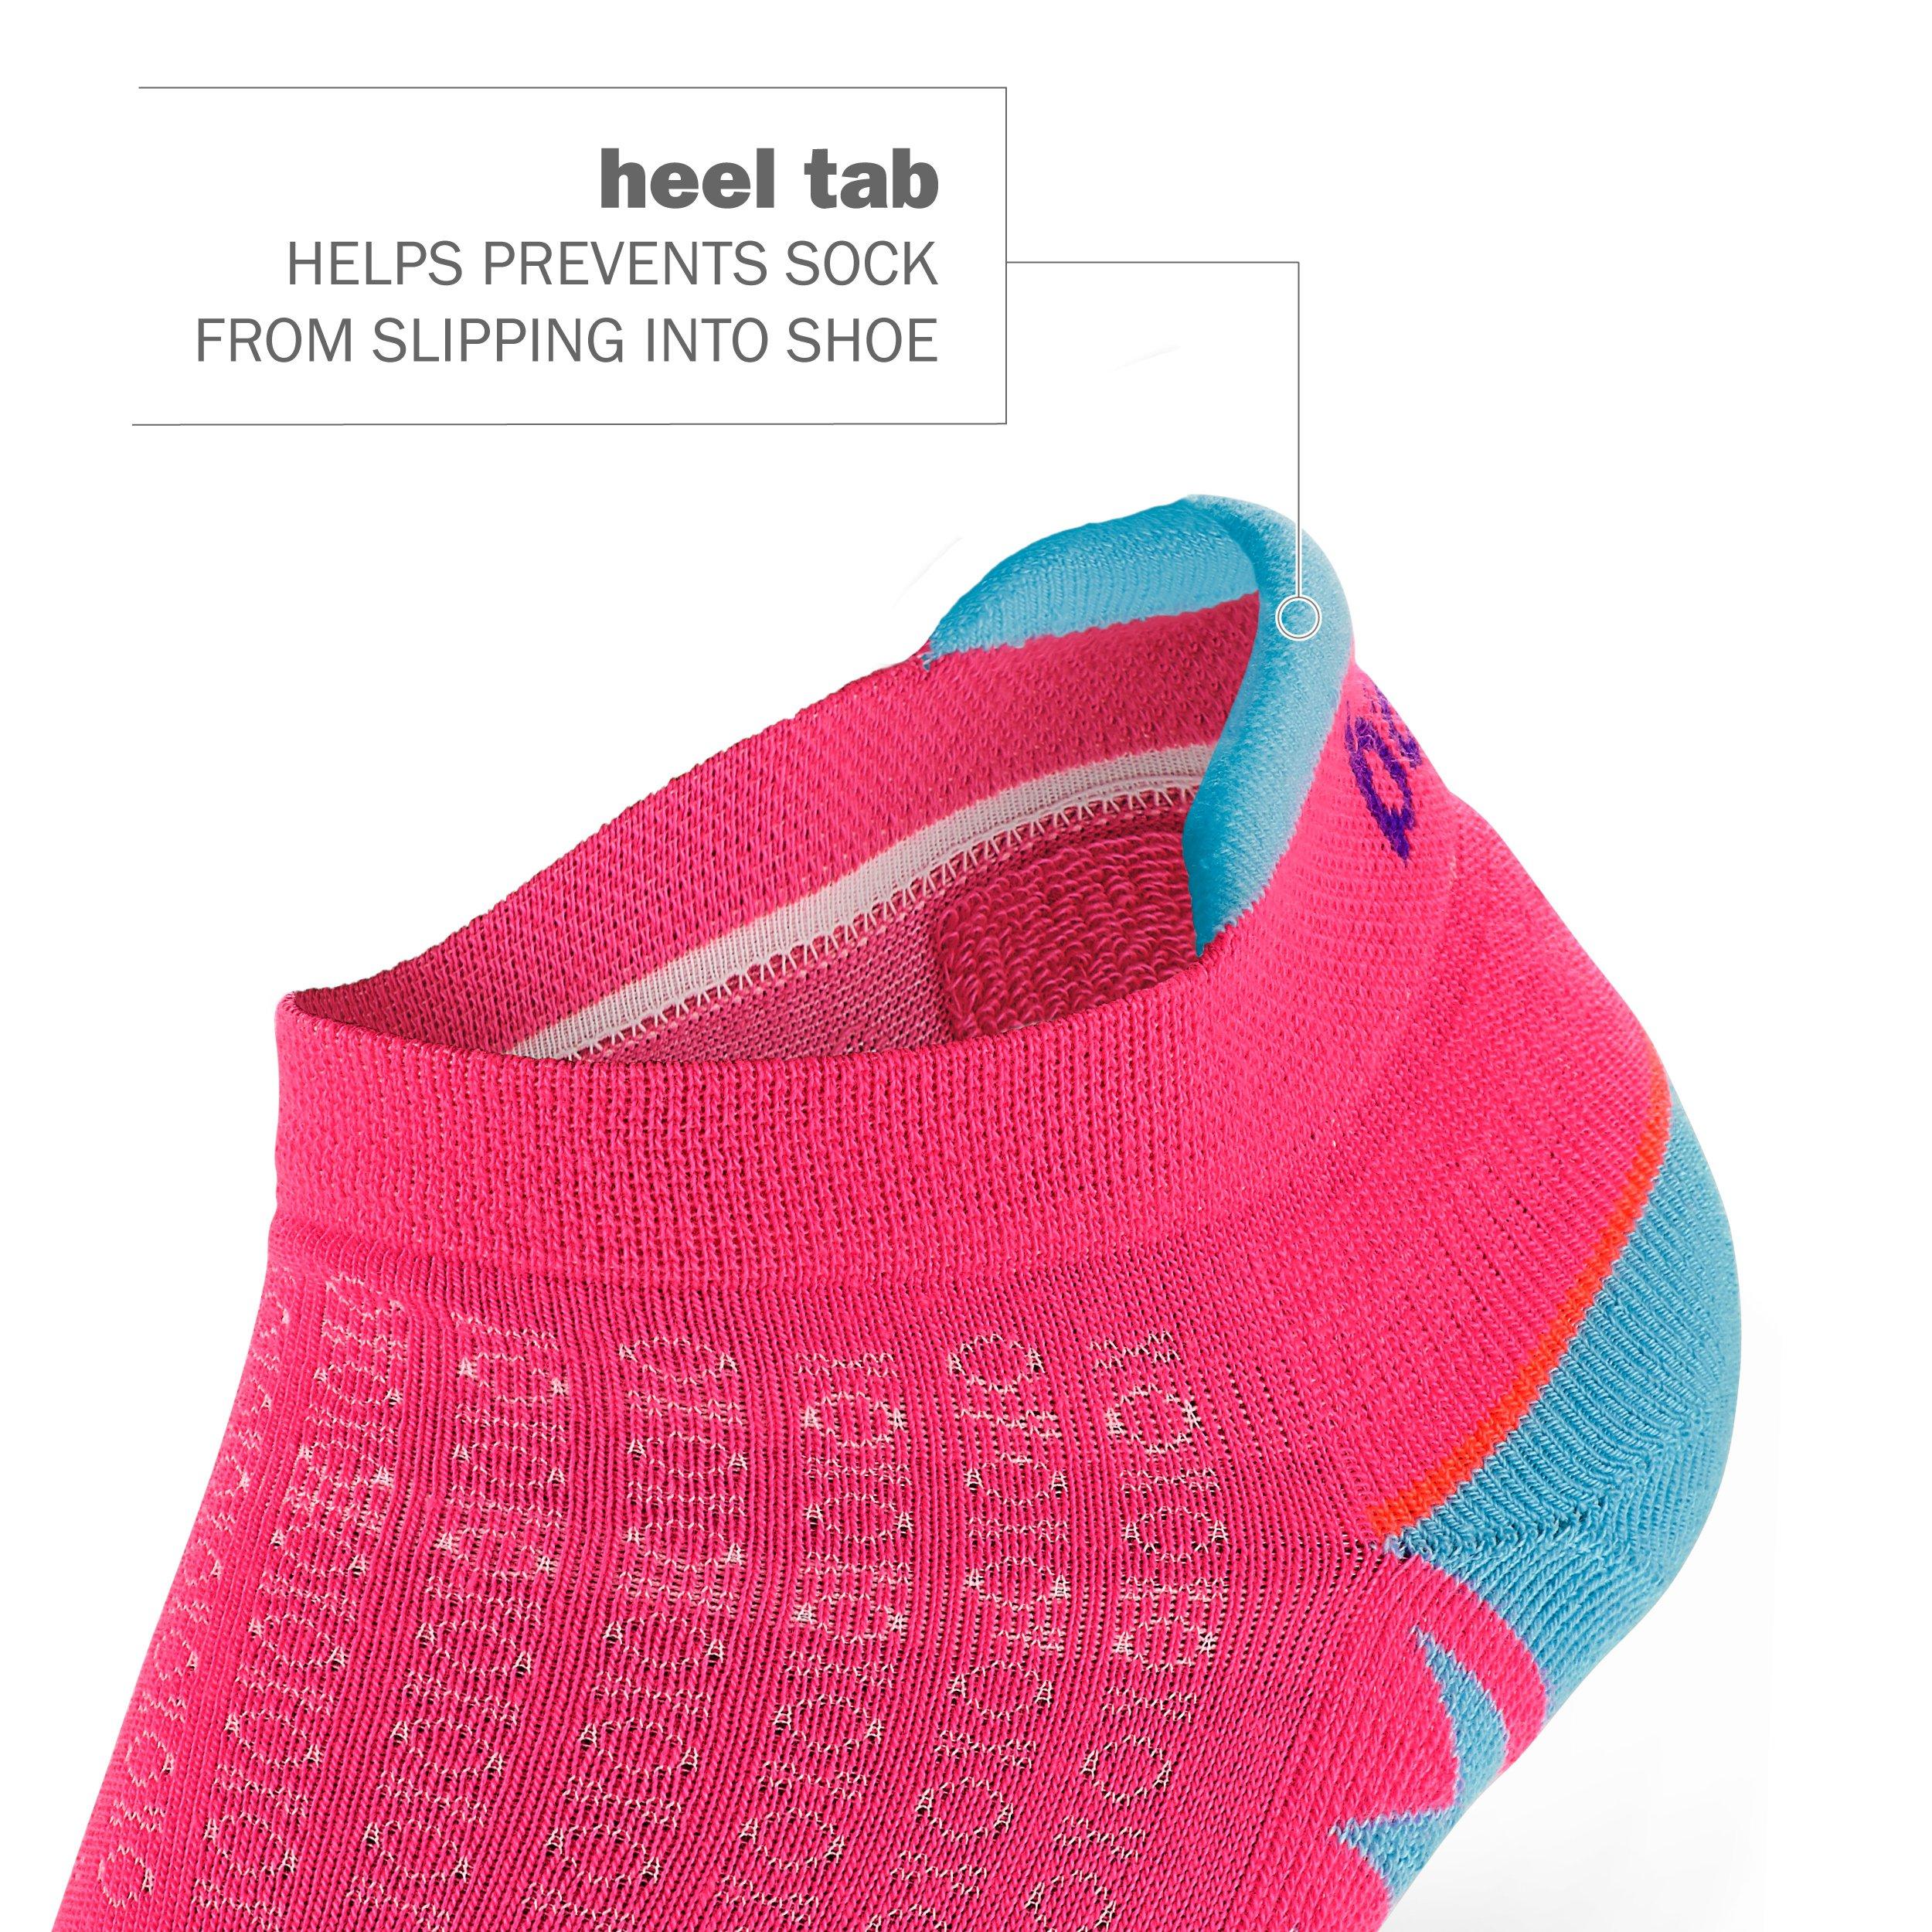 Balega Women's Enduro No Show Socks (1 Pair), Watermelon/Orange, Medium by Balega (Image #4)